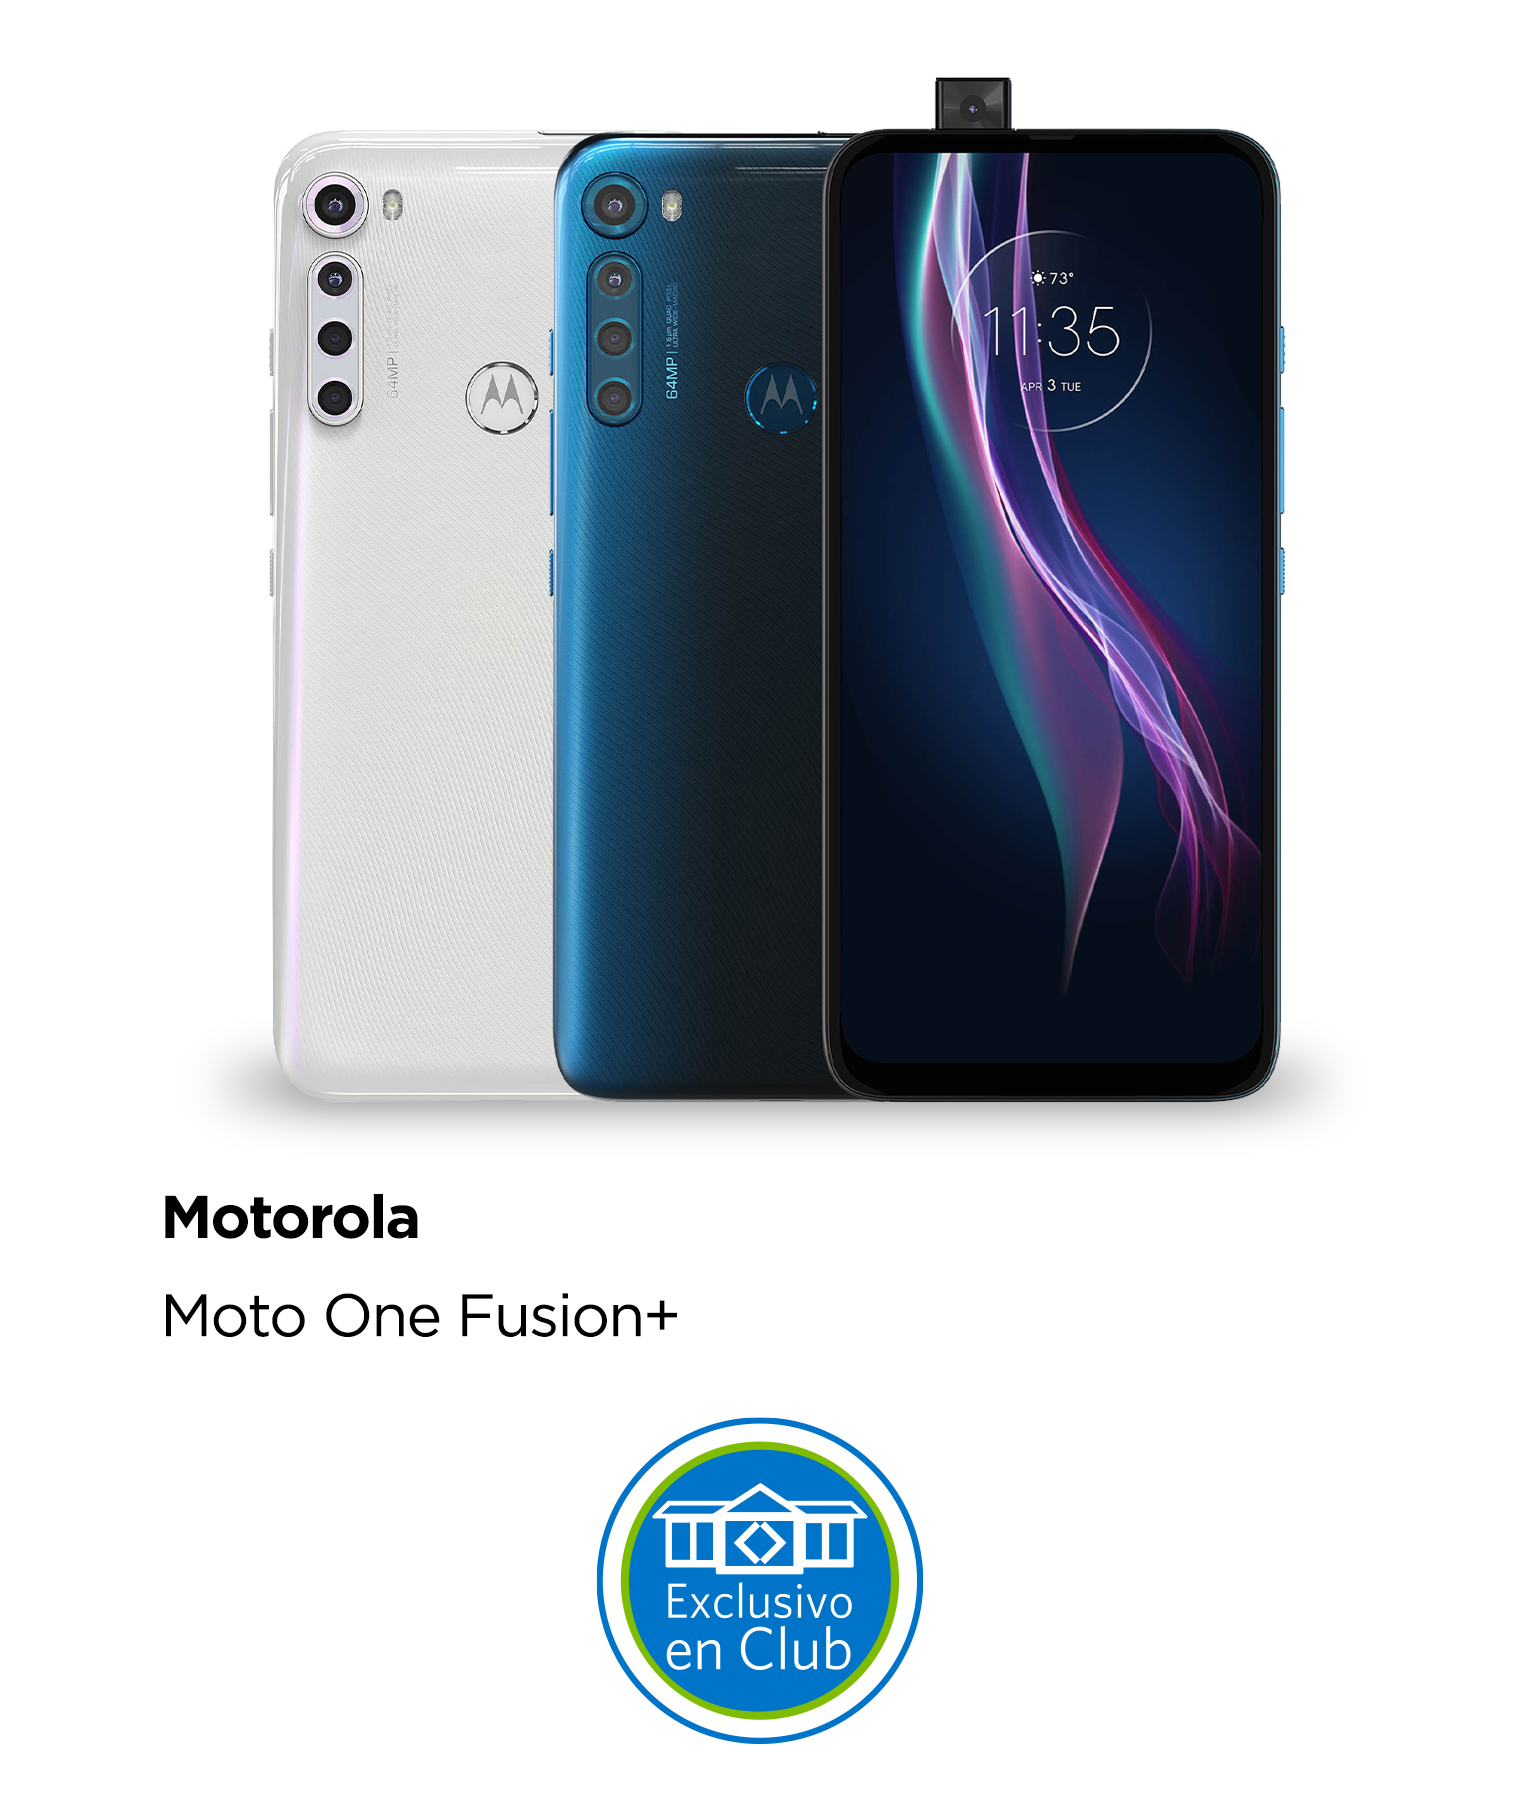 Motorola Moto One Fusion+